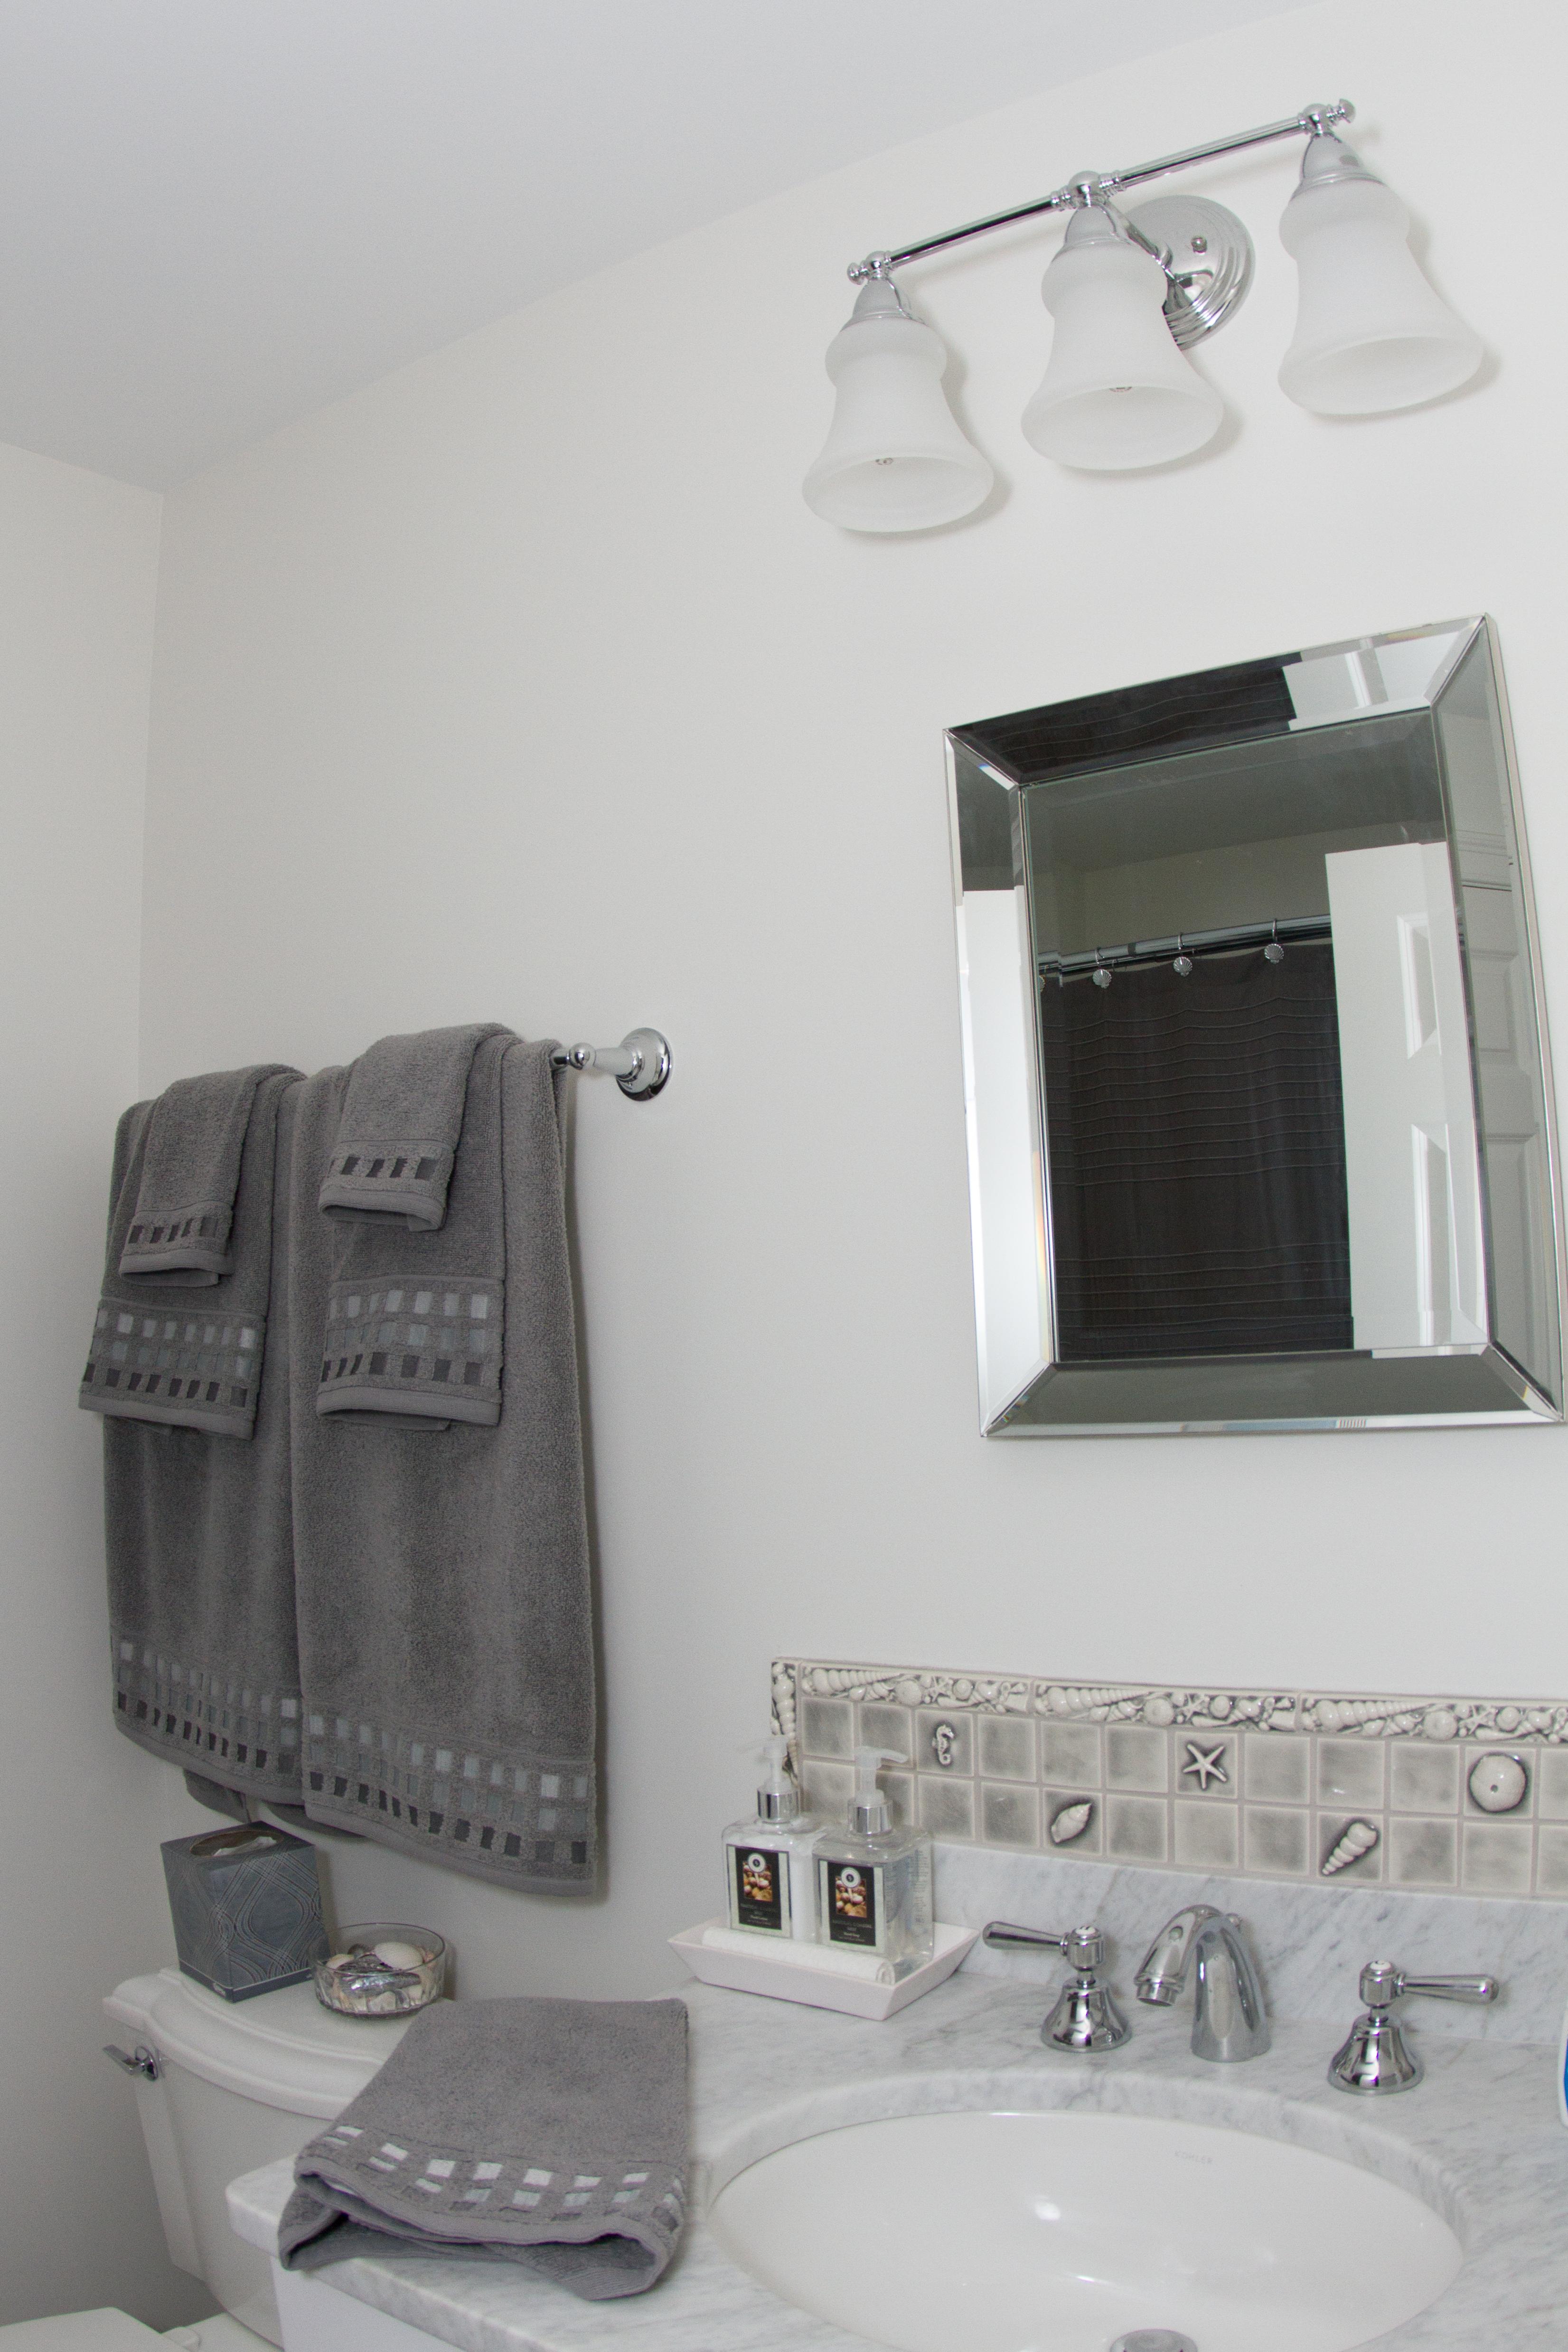 Bathroom Design And Renovations Kennebunk Kitchens And Baths - Bathroom design and renovations